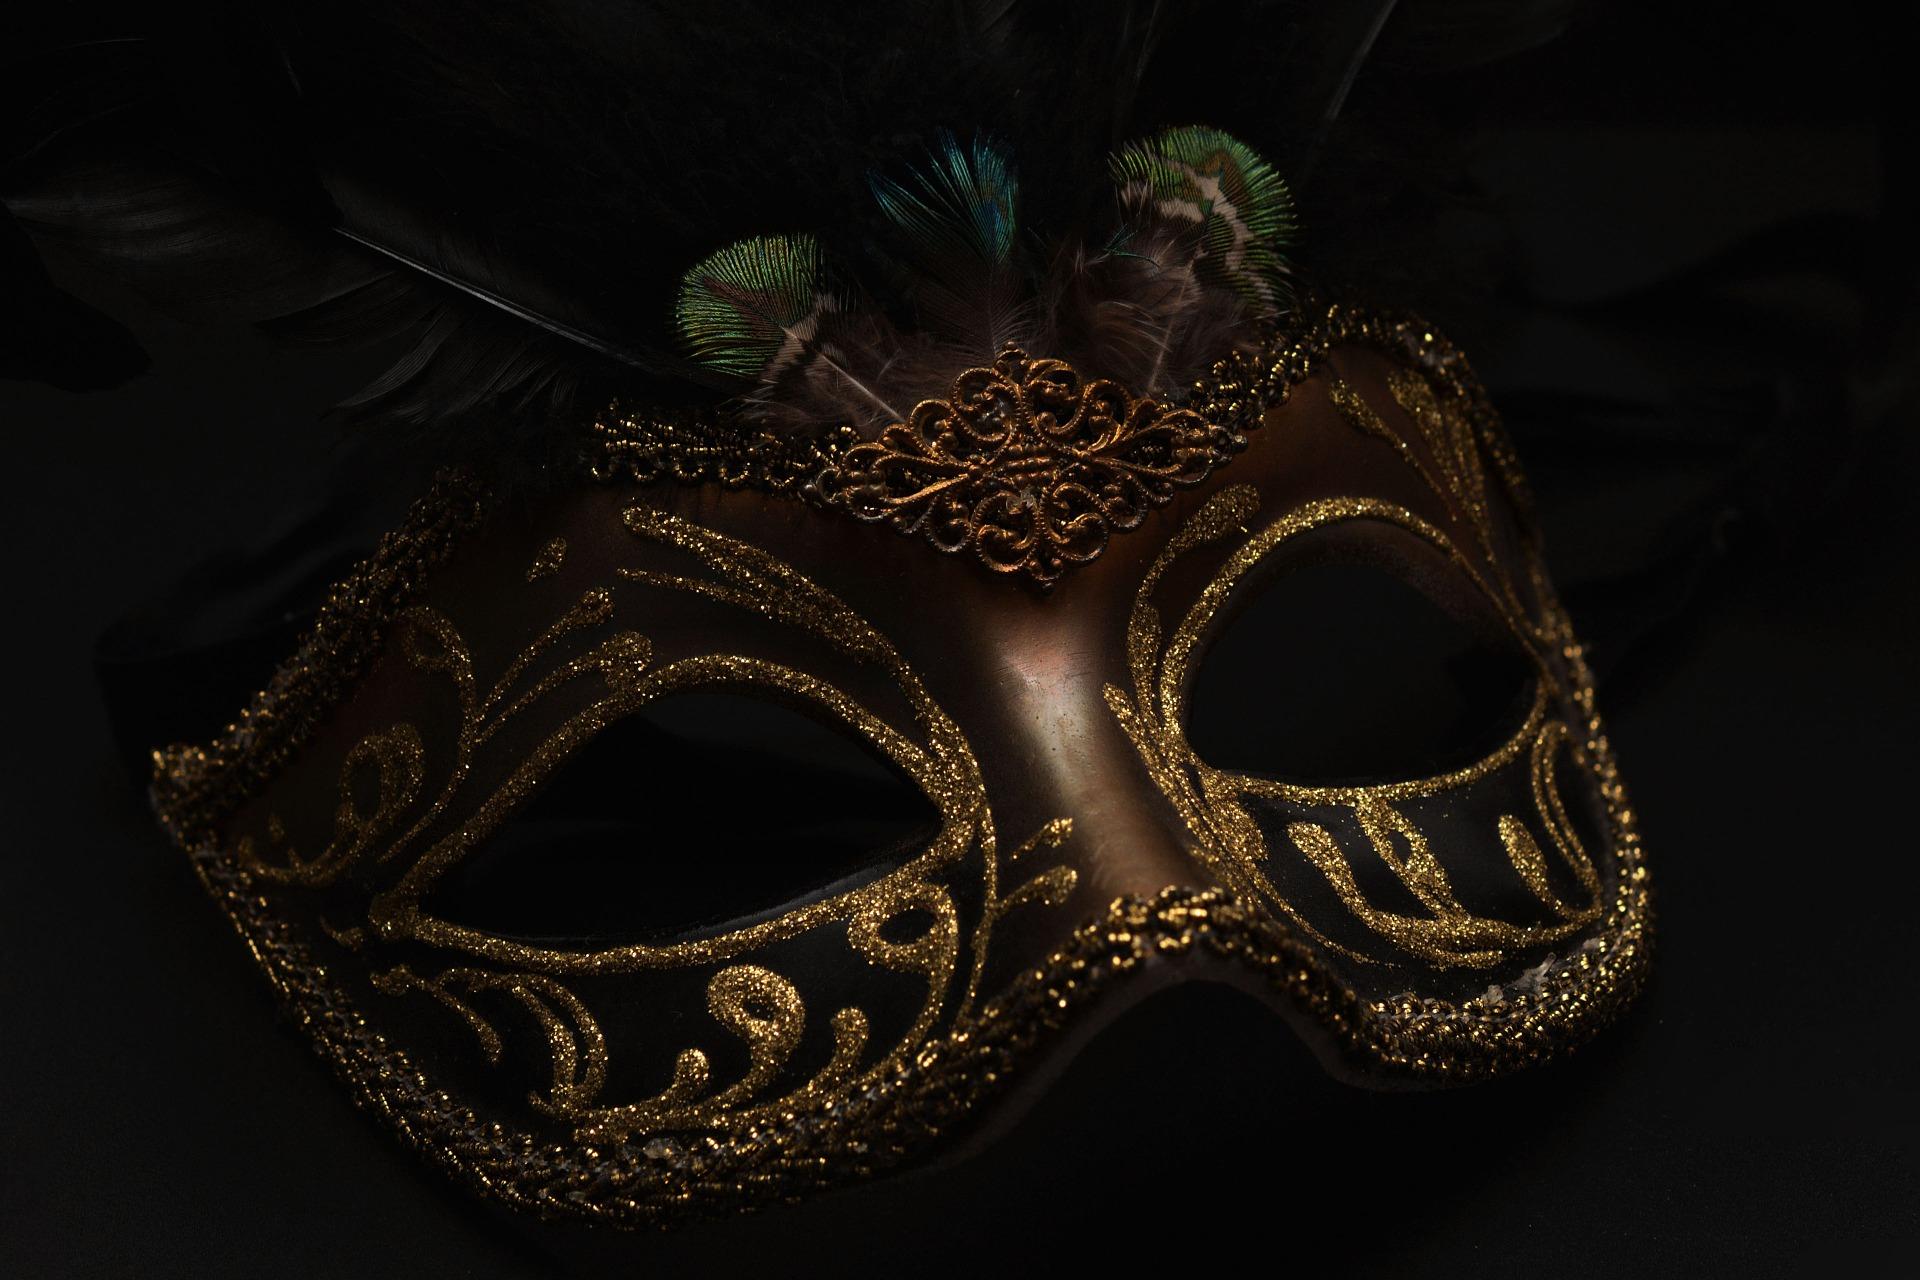 napoleon bonaparte mask-1150180_1920napoleon bonaparte mask-1150180_1920